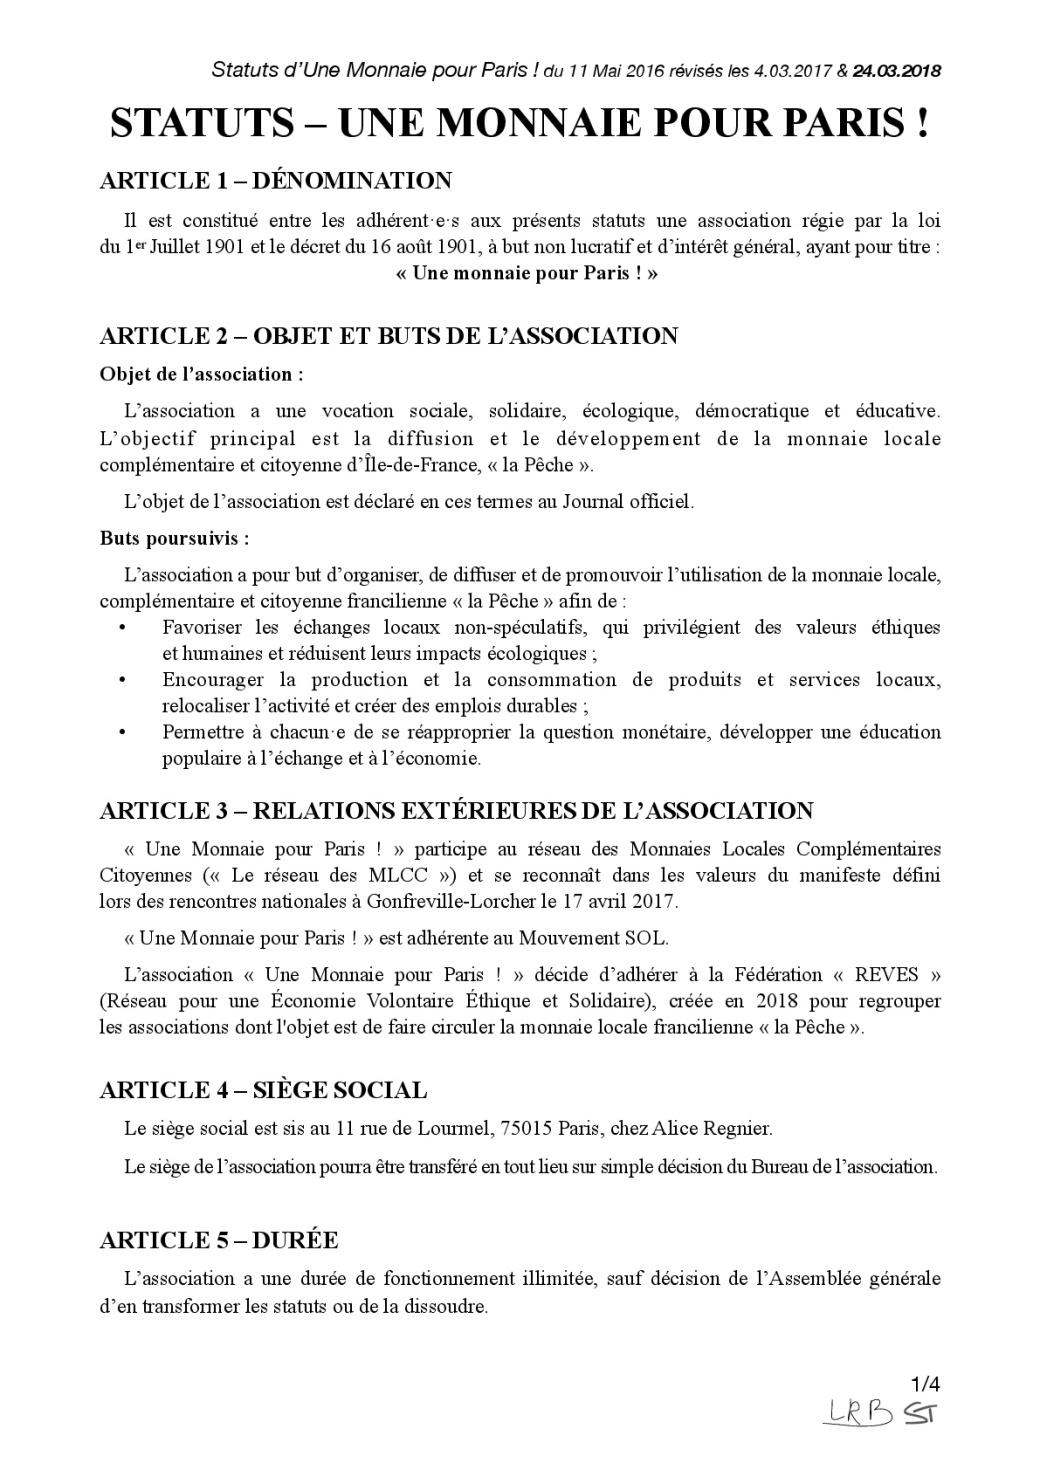 MoPPa_18.03.24_STATUTS-2018-15eme-001